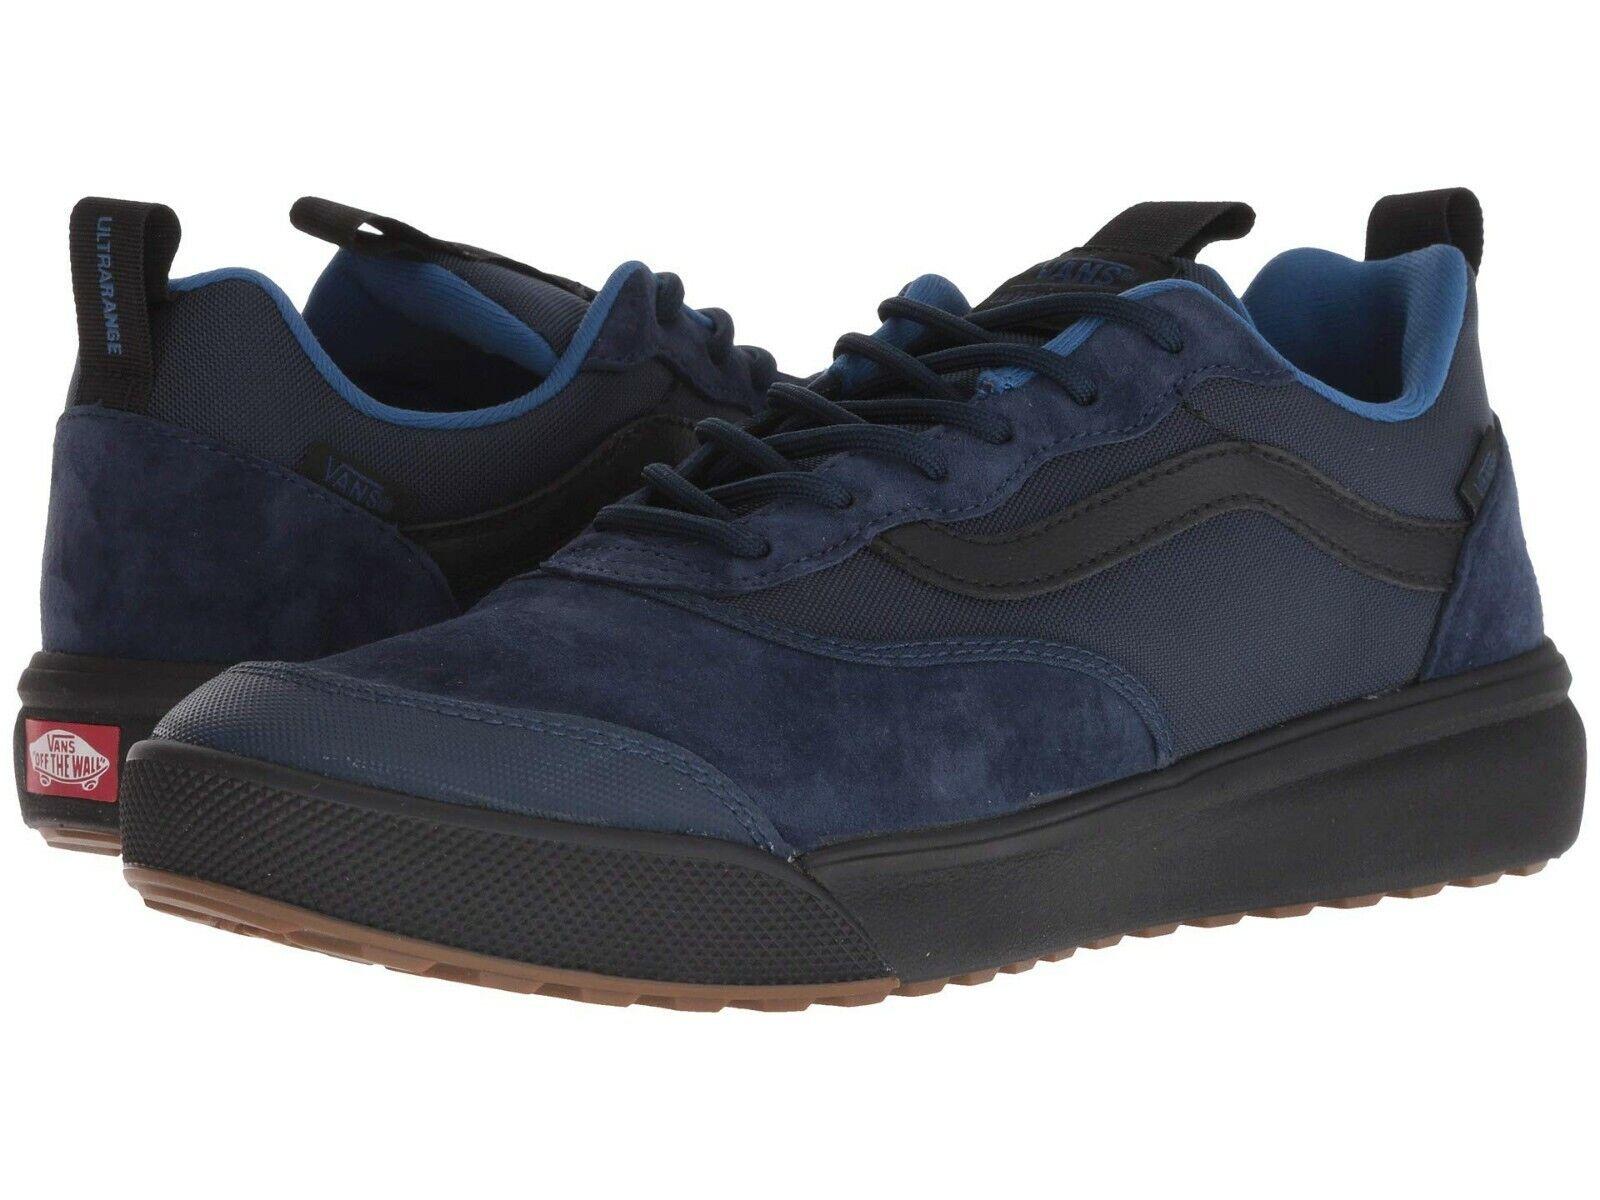 Vans ULTRARANGE PRO SKATE Shoes Size Men's 9.5 Black/Dress B